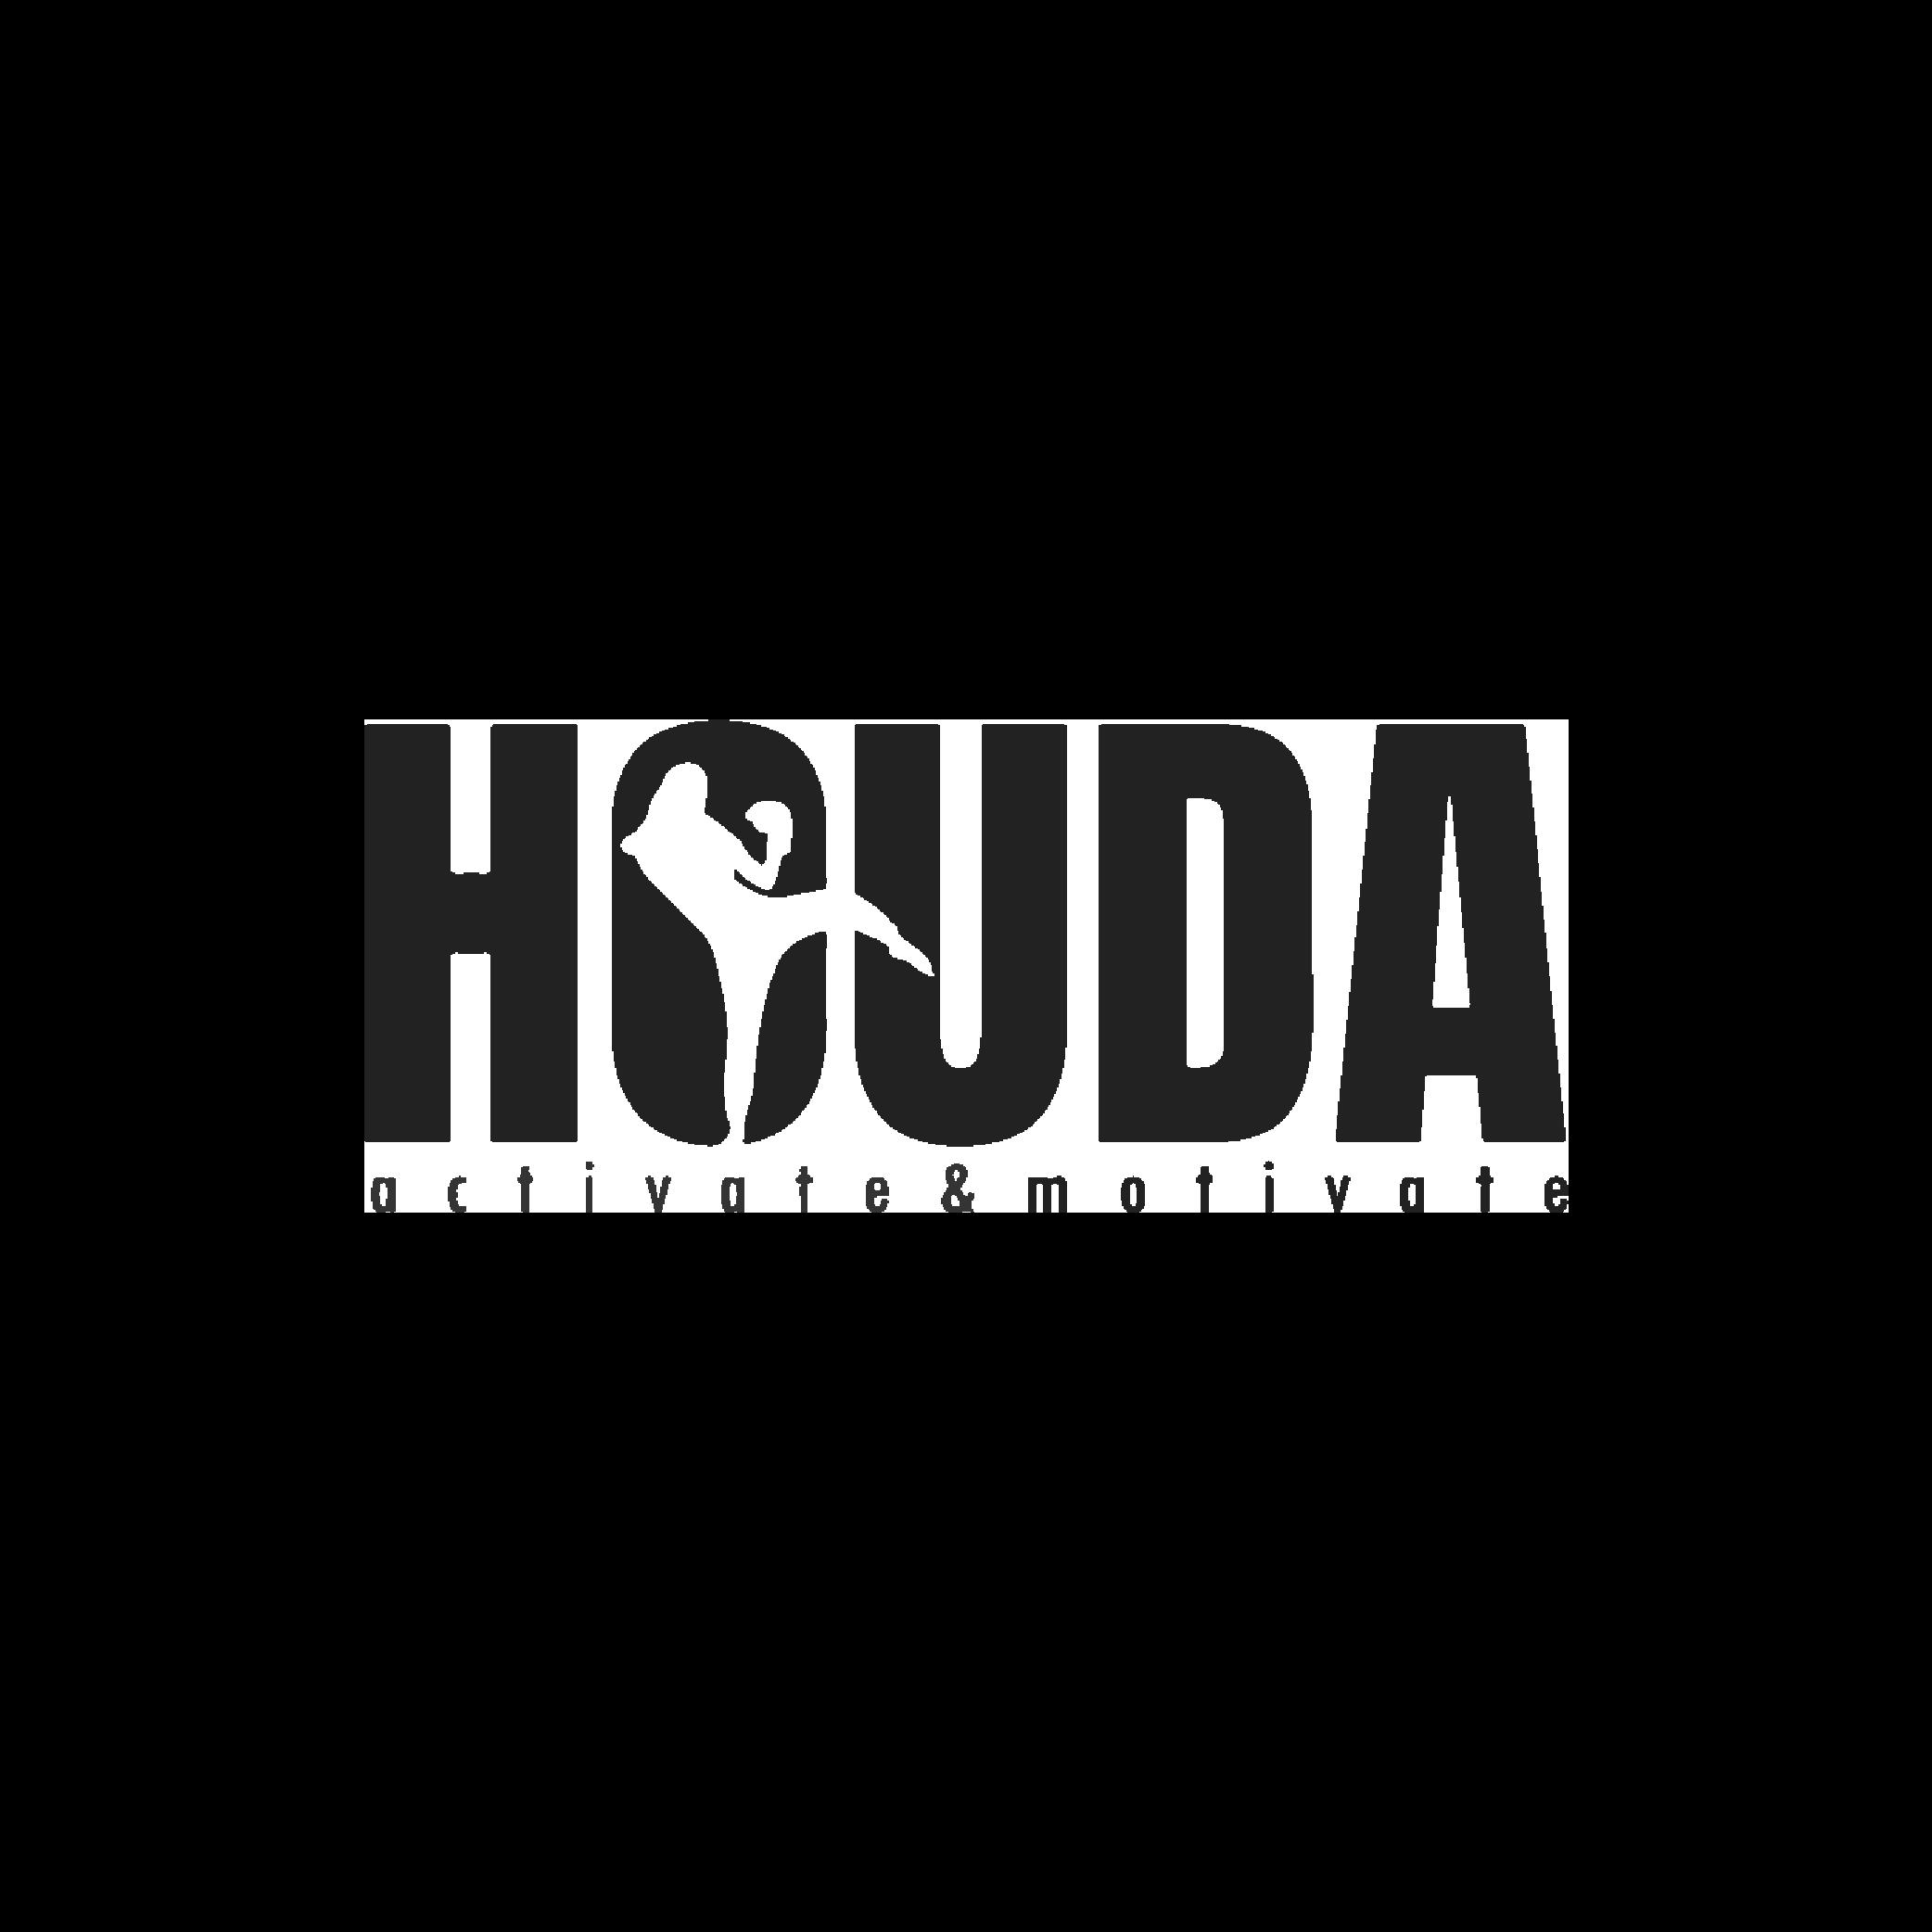 AD-Klant-Houda-bw